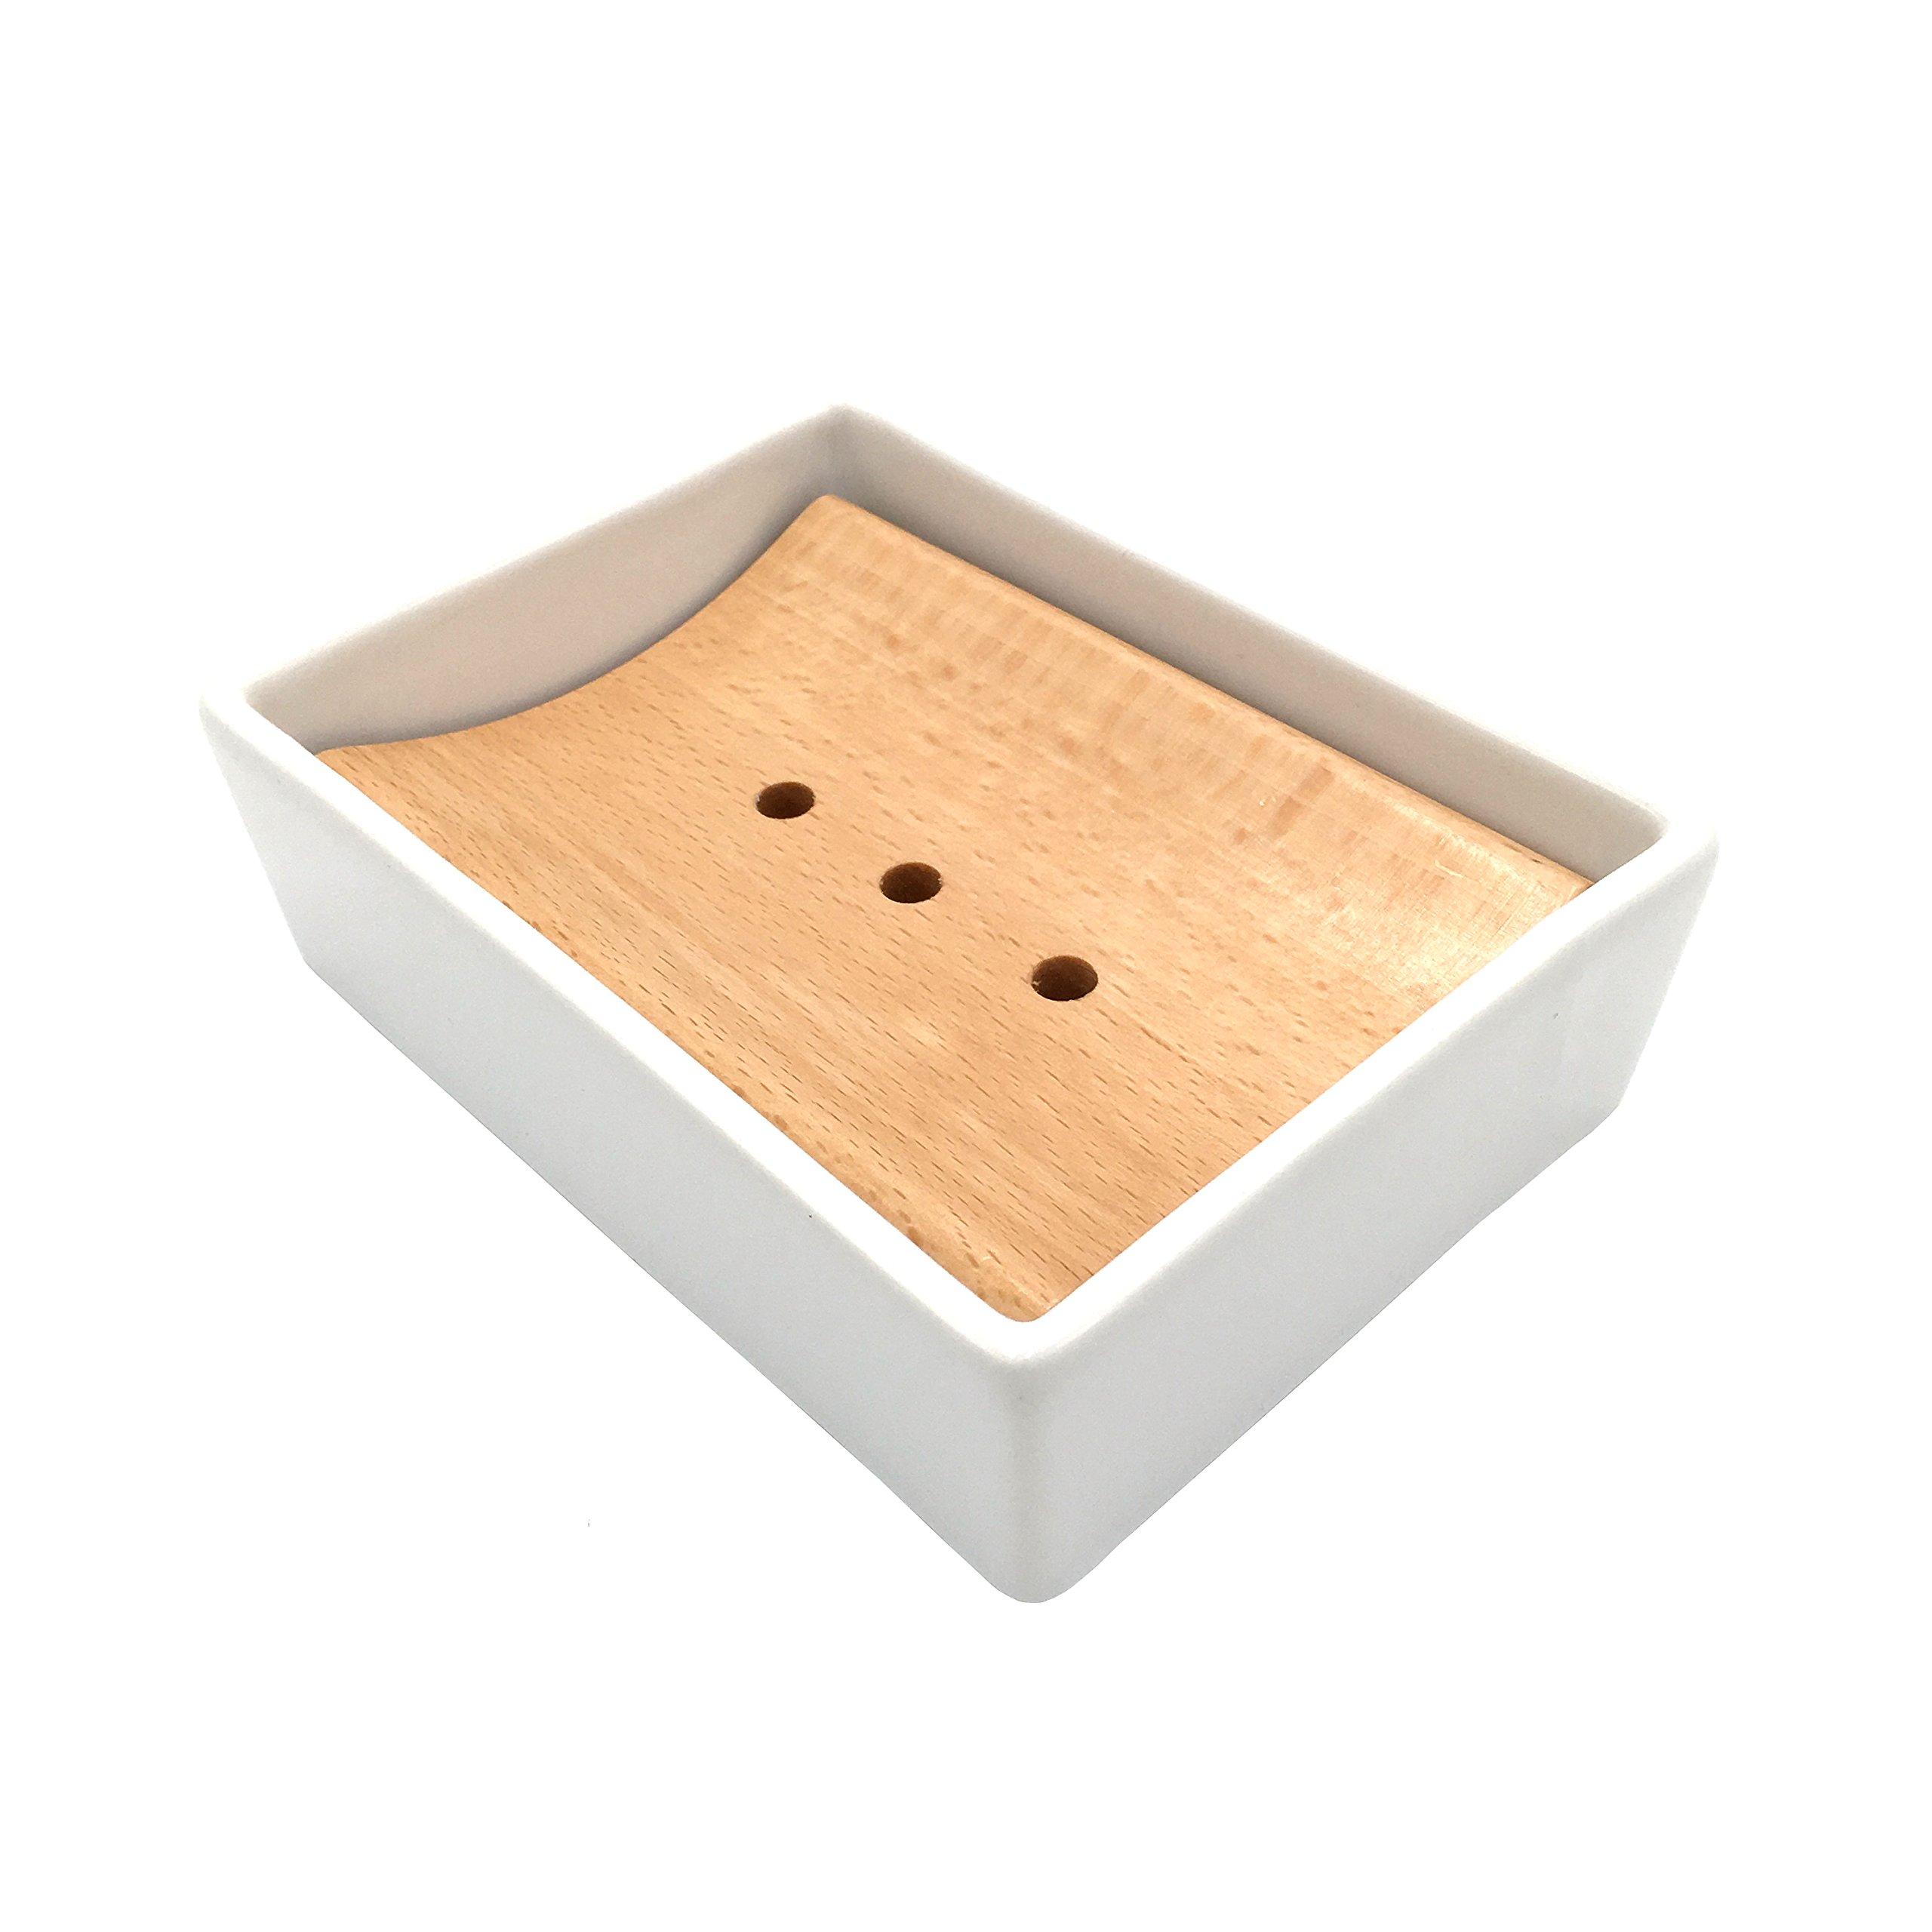 Lofekea Ceramic Soap Dish Soap Holder for Bathroom and Shower Double Layer Draining Soap Box (Wood) by Lofekea